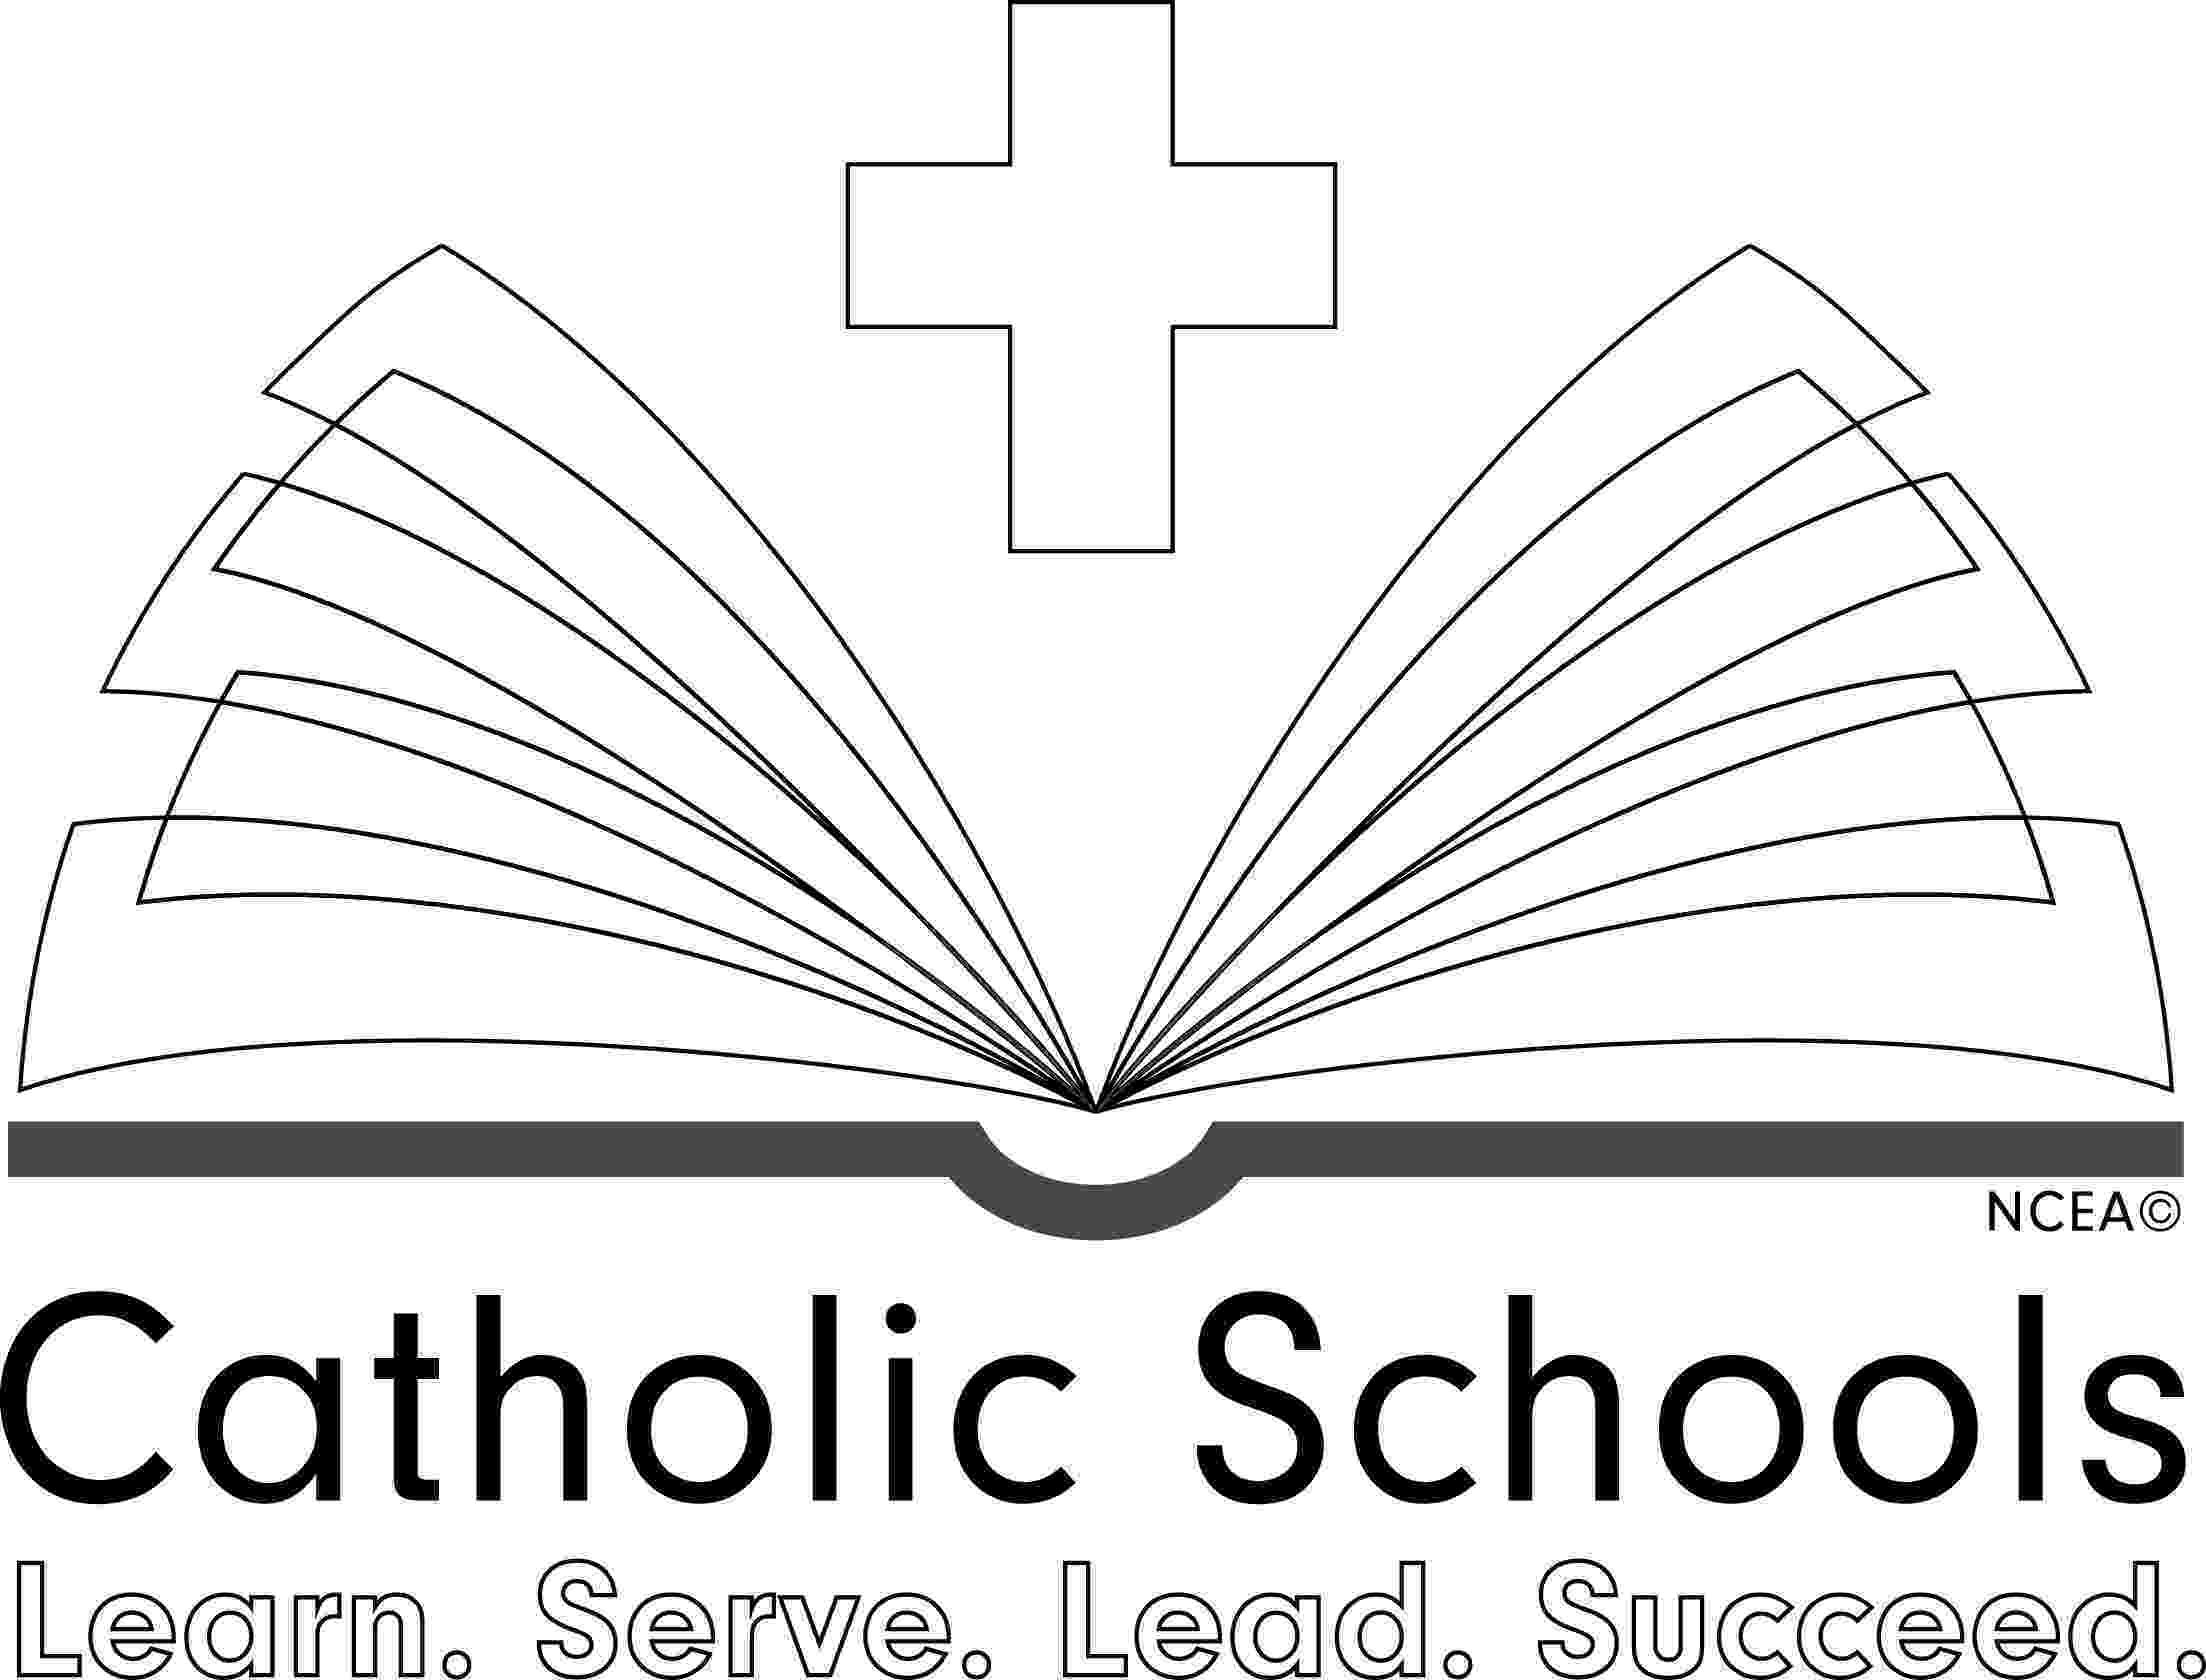 coloring book themes catholic schools week logos and themes book coloring themes